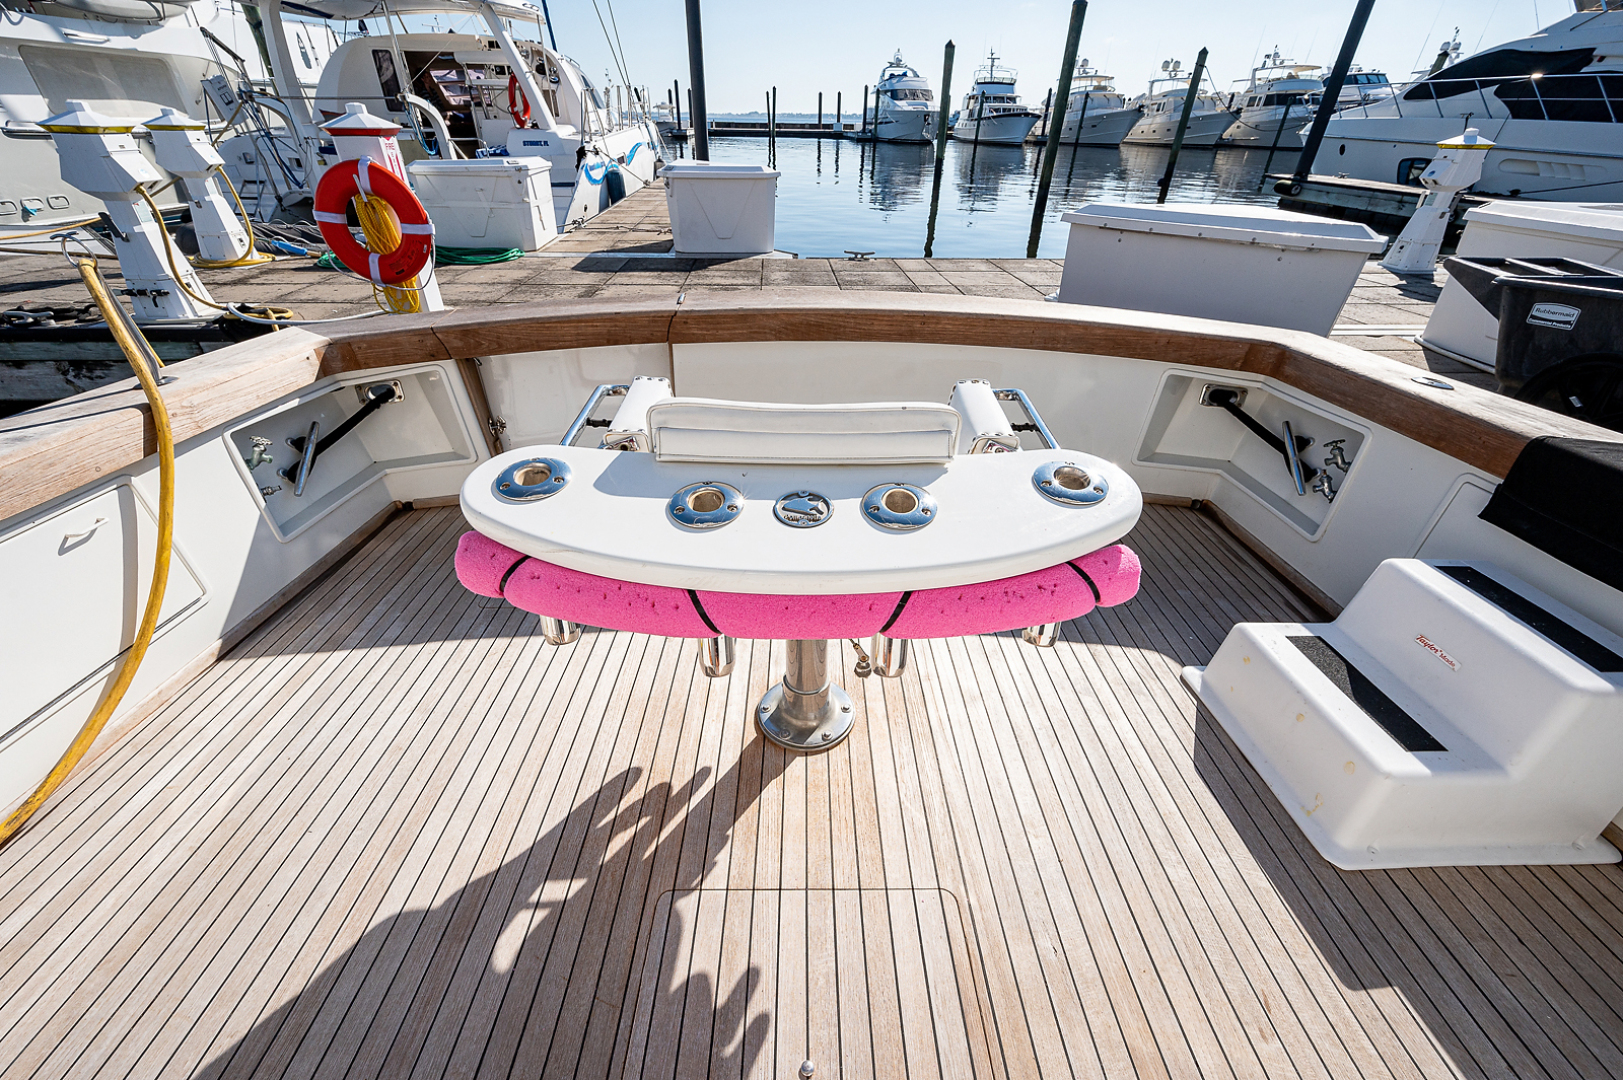 Ocean Yachts-Super Sport 1990-Blue Ridge Runner Stuart-Florida-United States-Cockpit-1598187 | Thumbnail